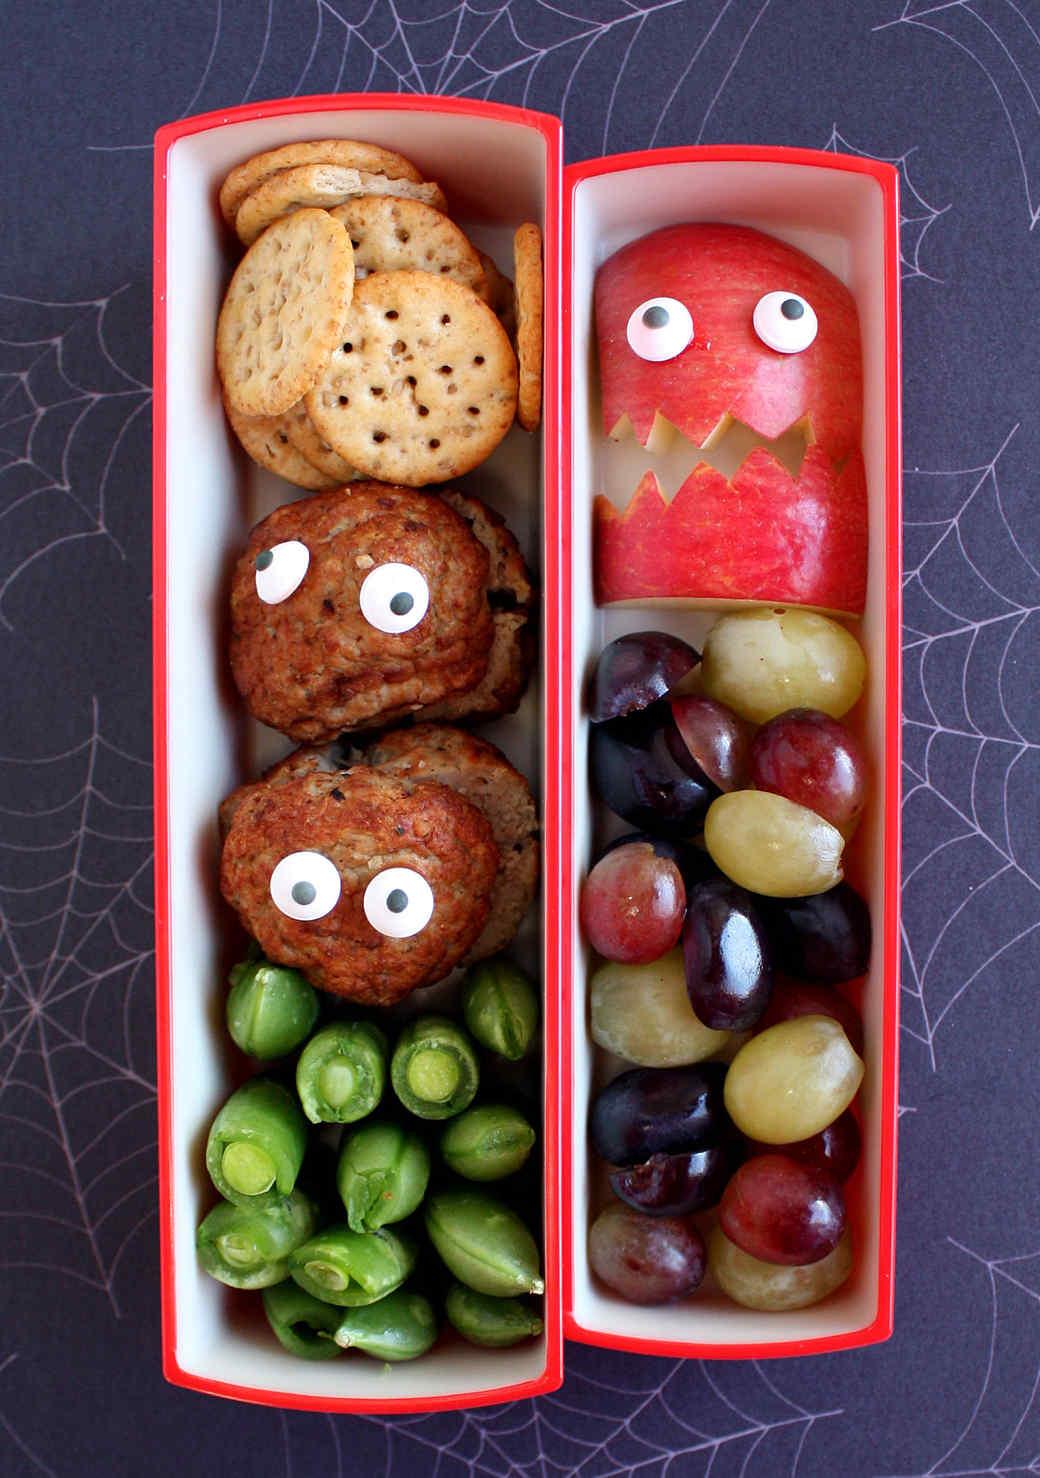 meatballs-nut-free-lunch.jpg (skyword:335937)